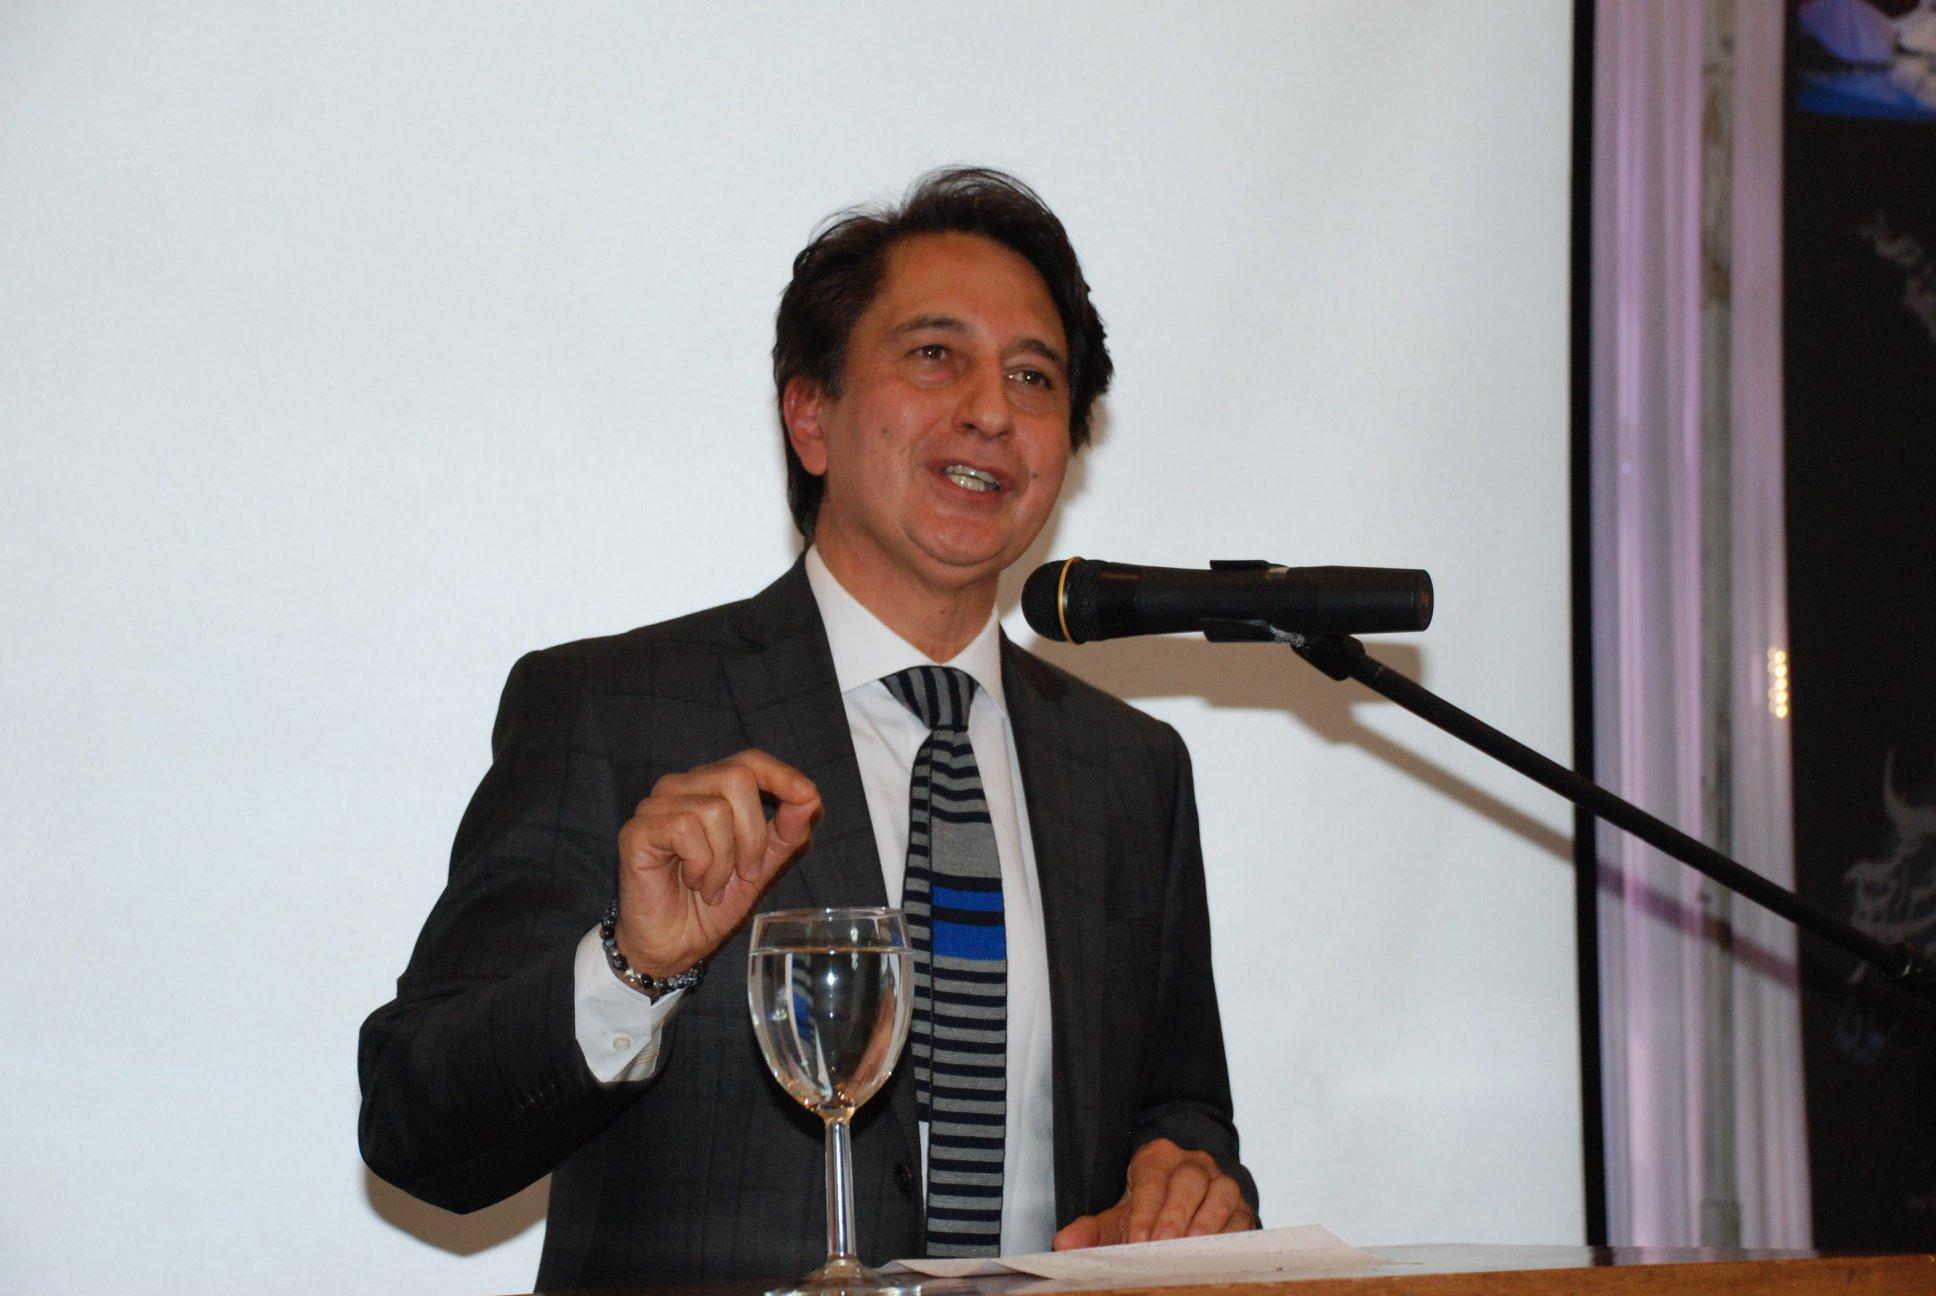 Photo of سفیر افغانستان در بریتانیا: حکومت افغانستان برای مصالحه با طالبان برنامه جامع و فراگیر دارد.